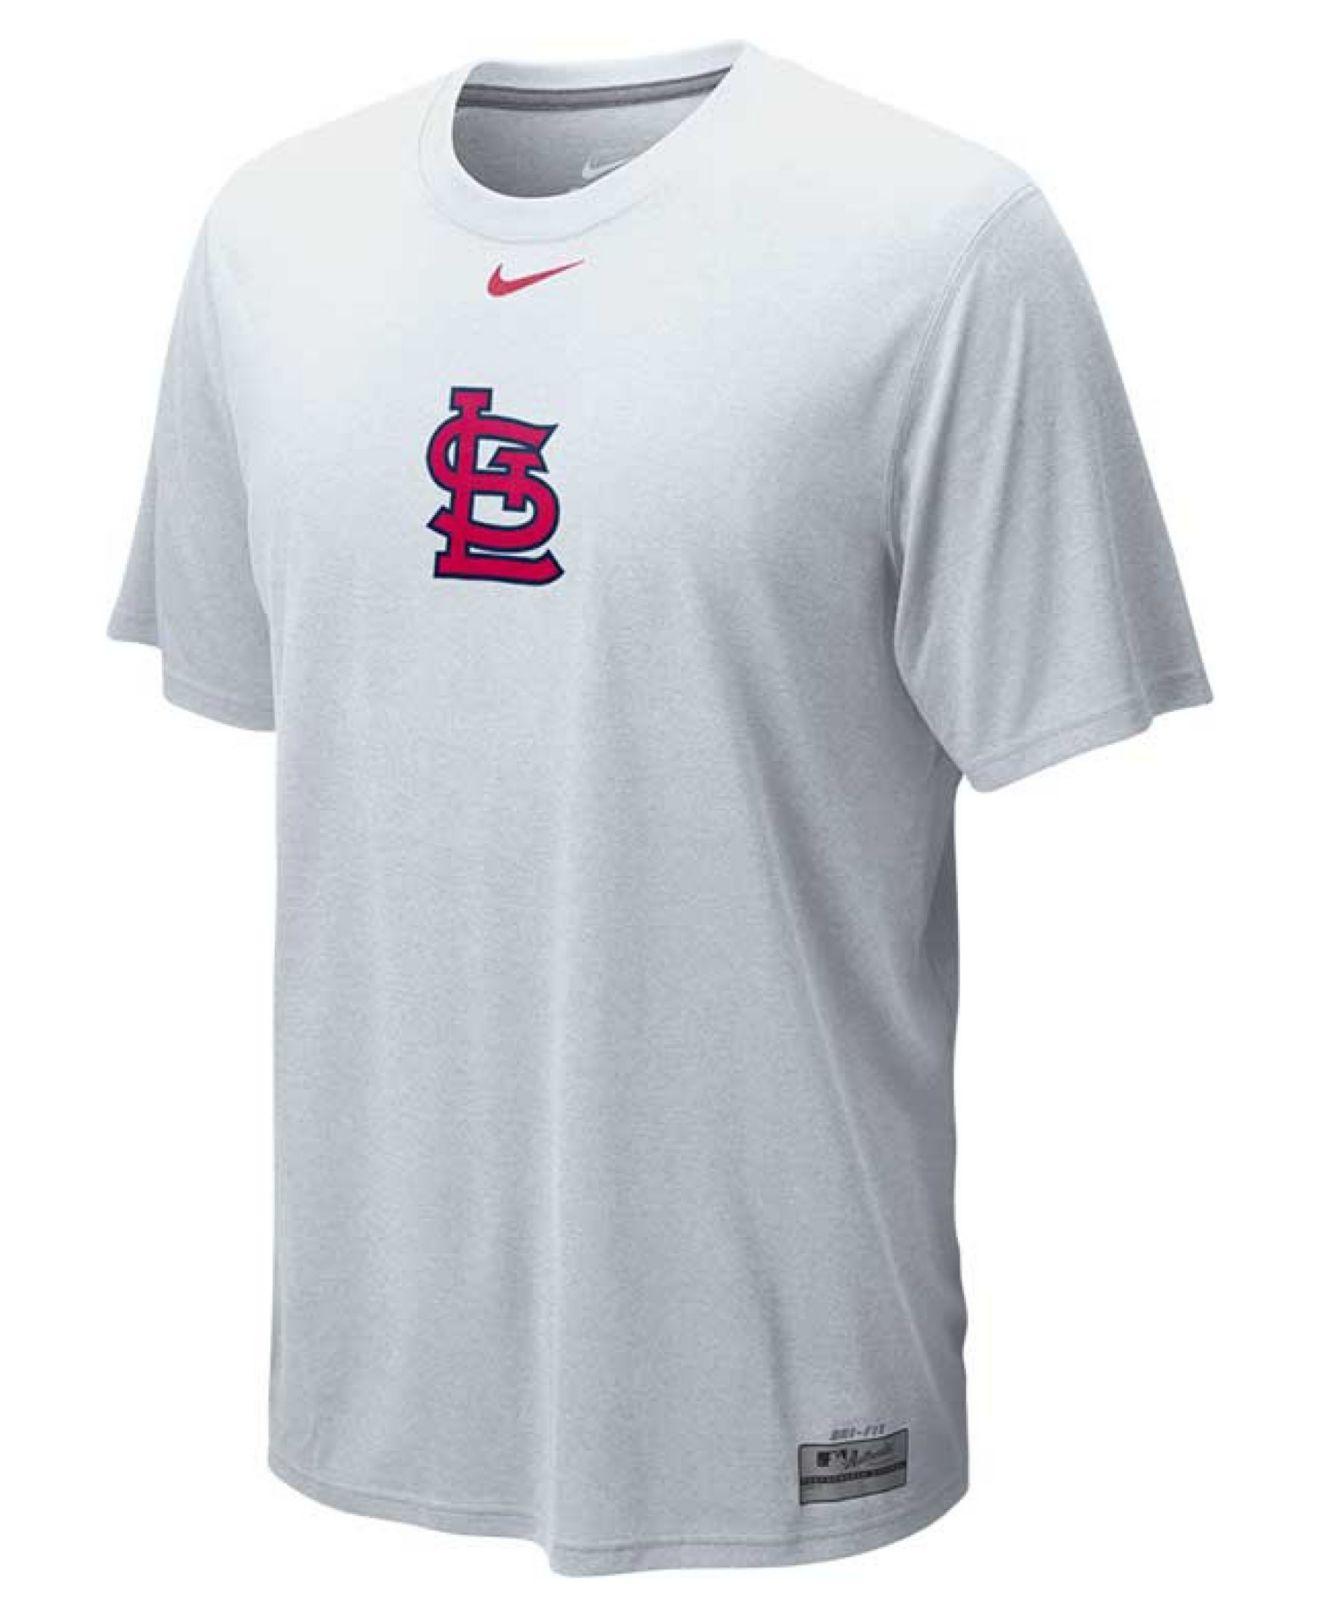 Lyst - Nike Men s St. Louis Cardinals Dri-fit Logo Legend T-shirt in ... a6f6f894e